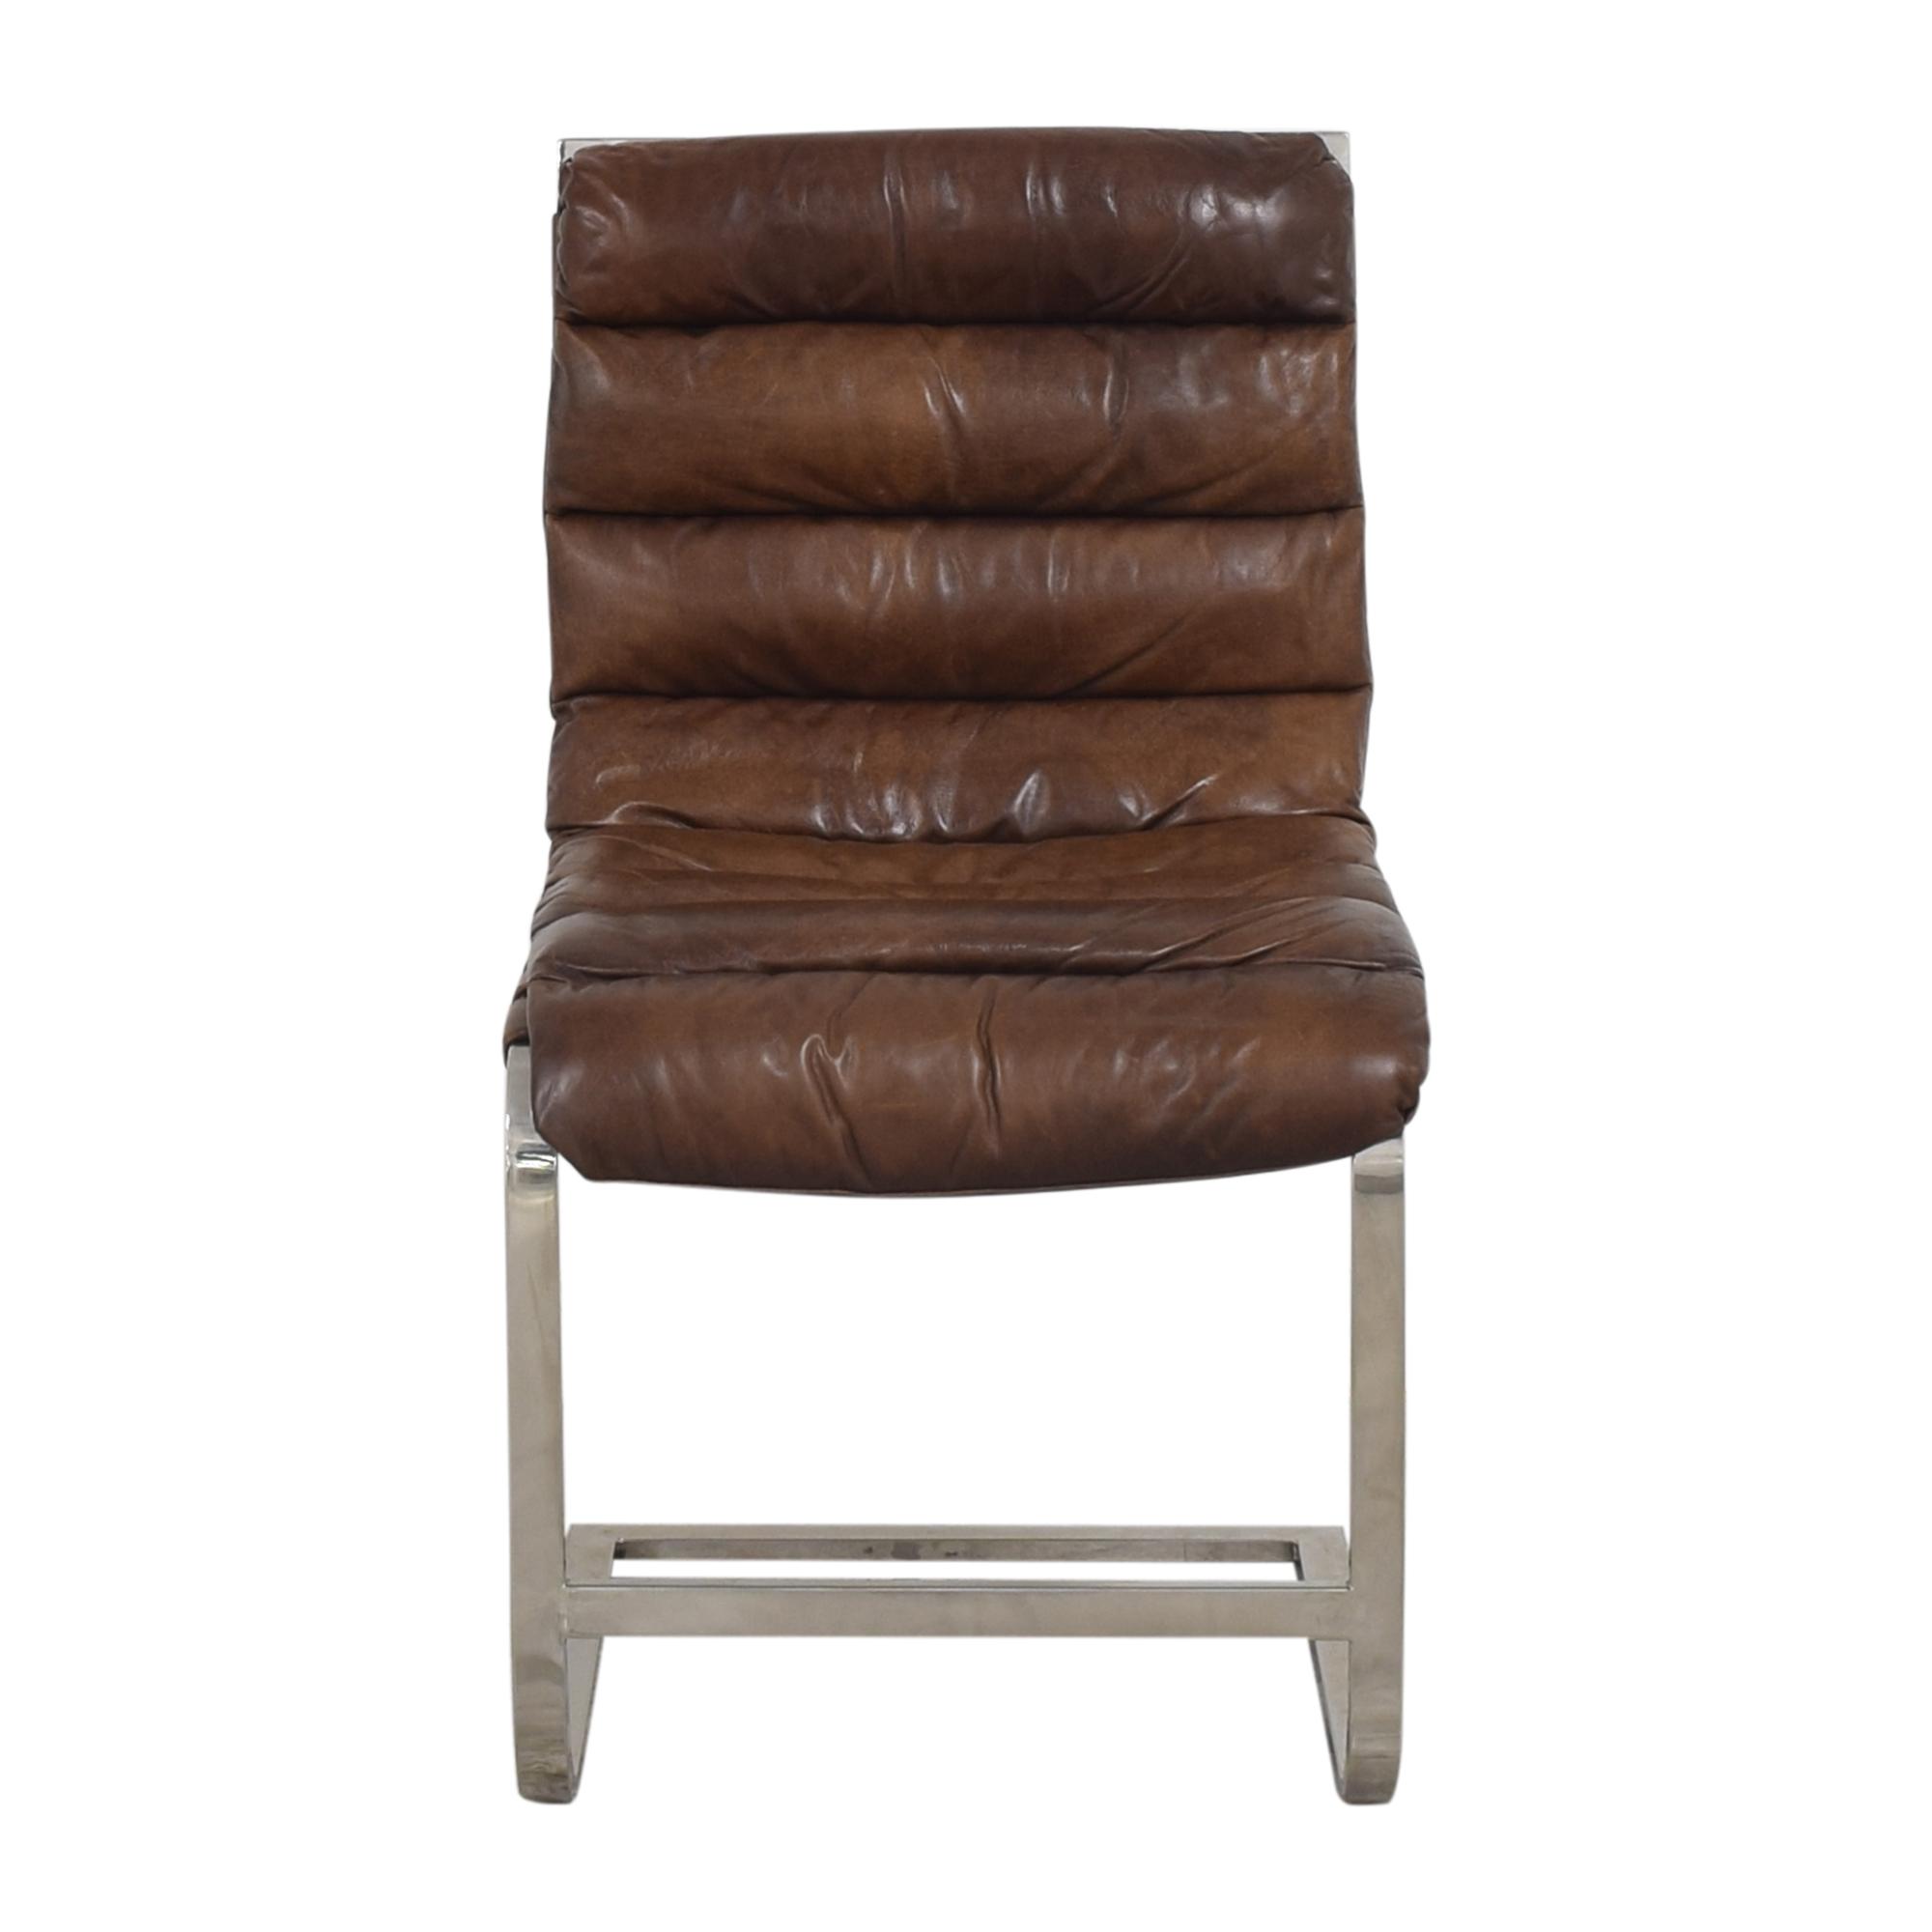 Restoration Hardware Restoration Hardware Oviedo Modern Side Chair brown & silver